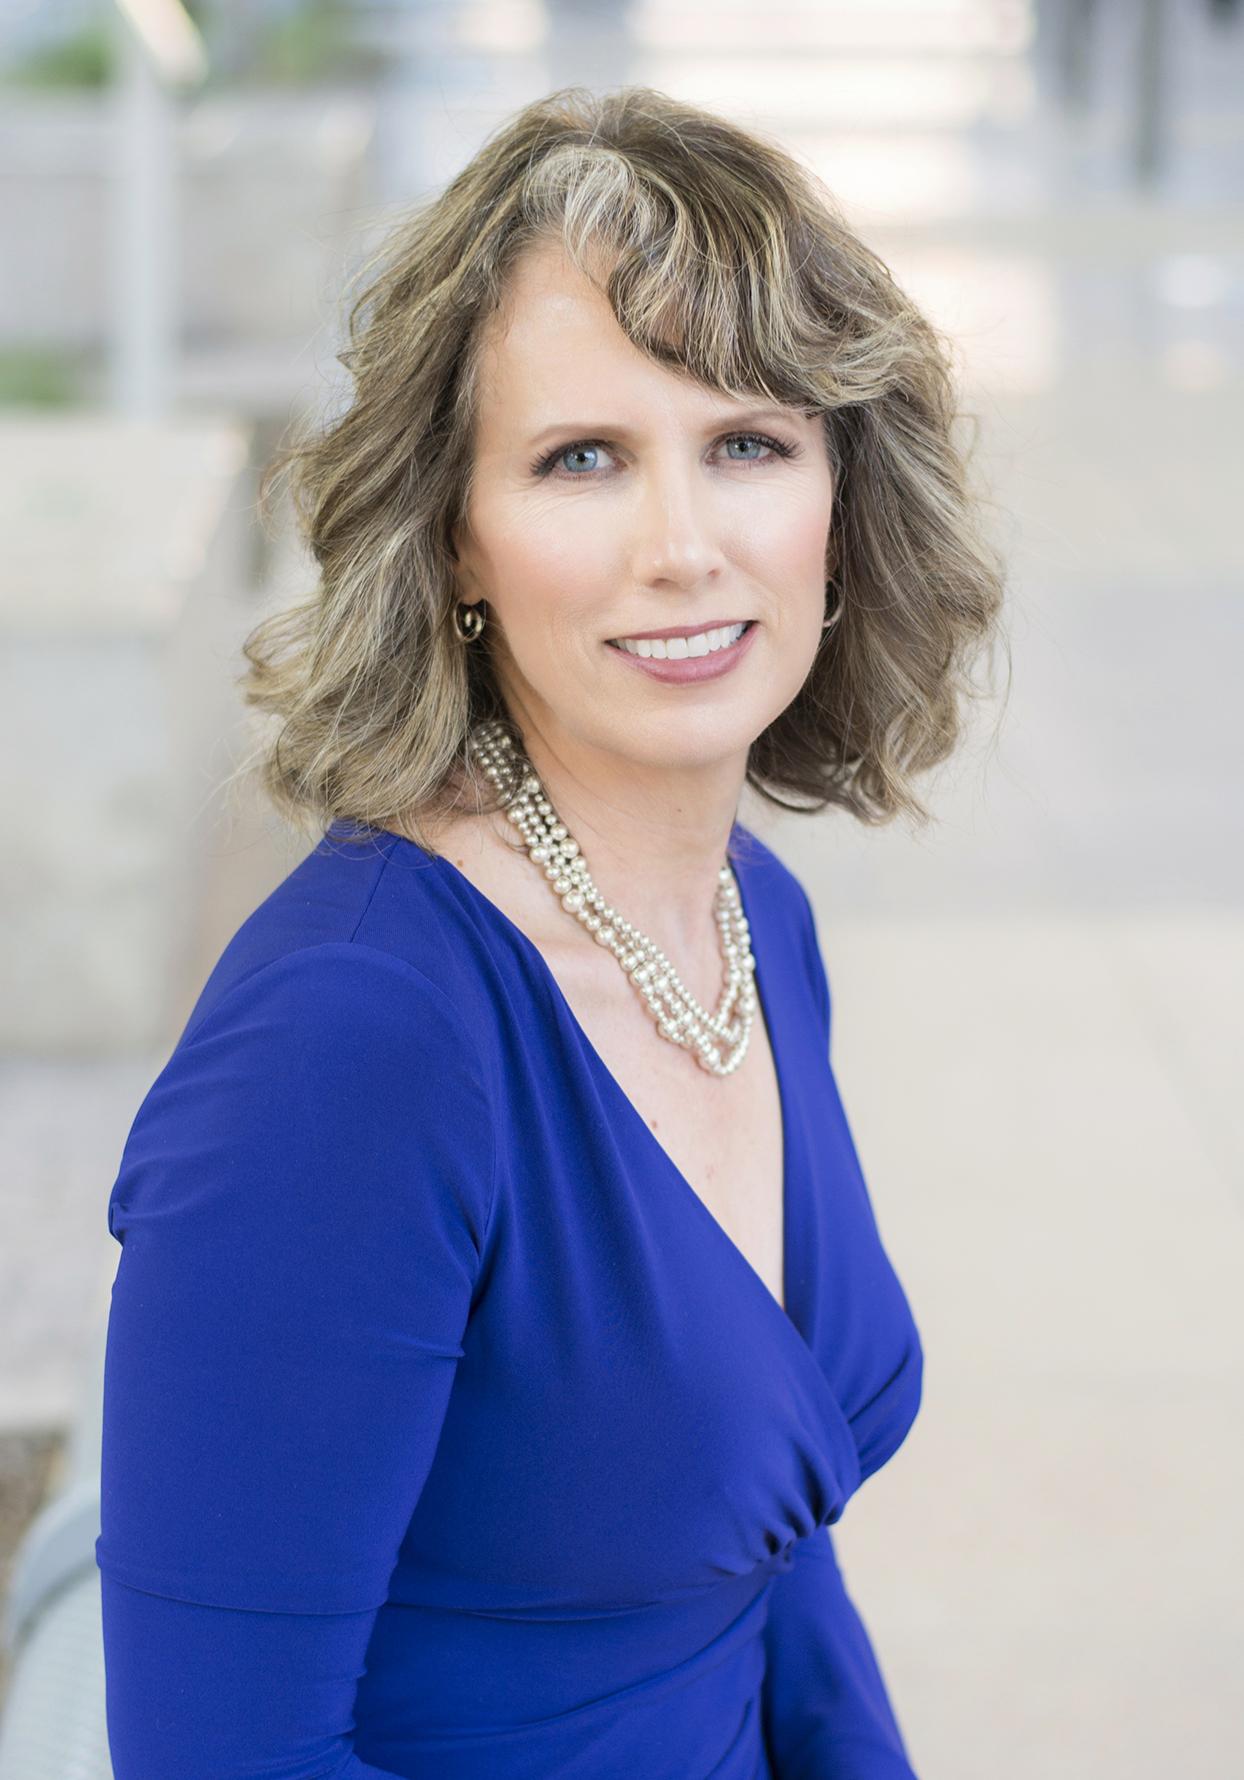 Renata Smith | Your Thrive Financial Partner